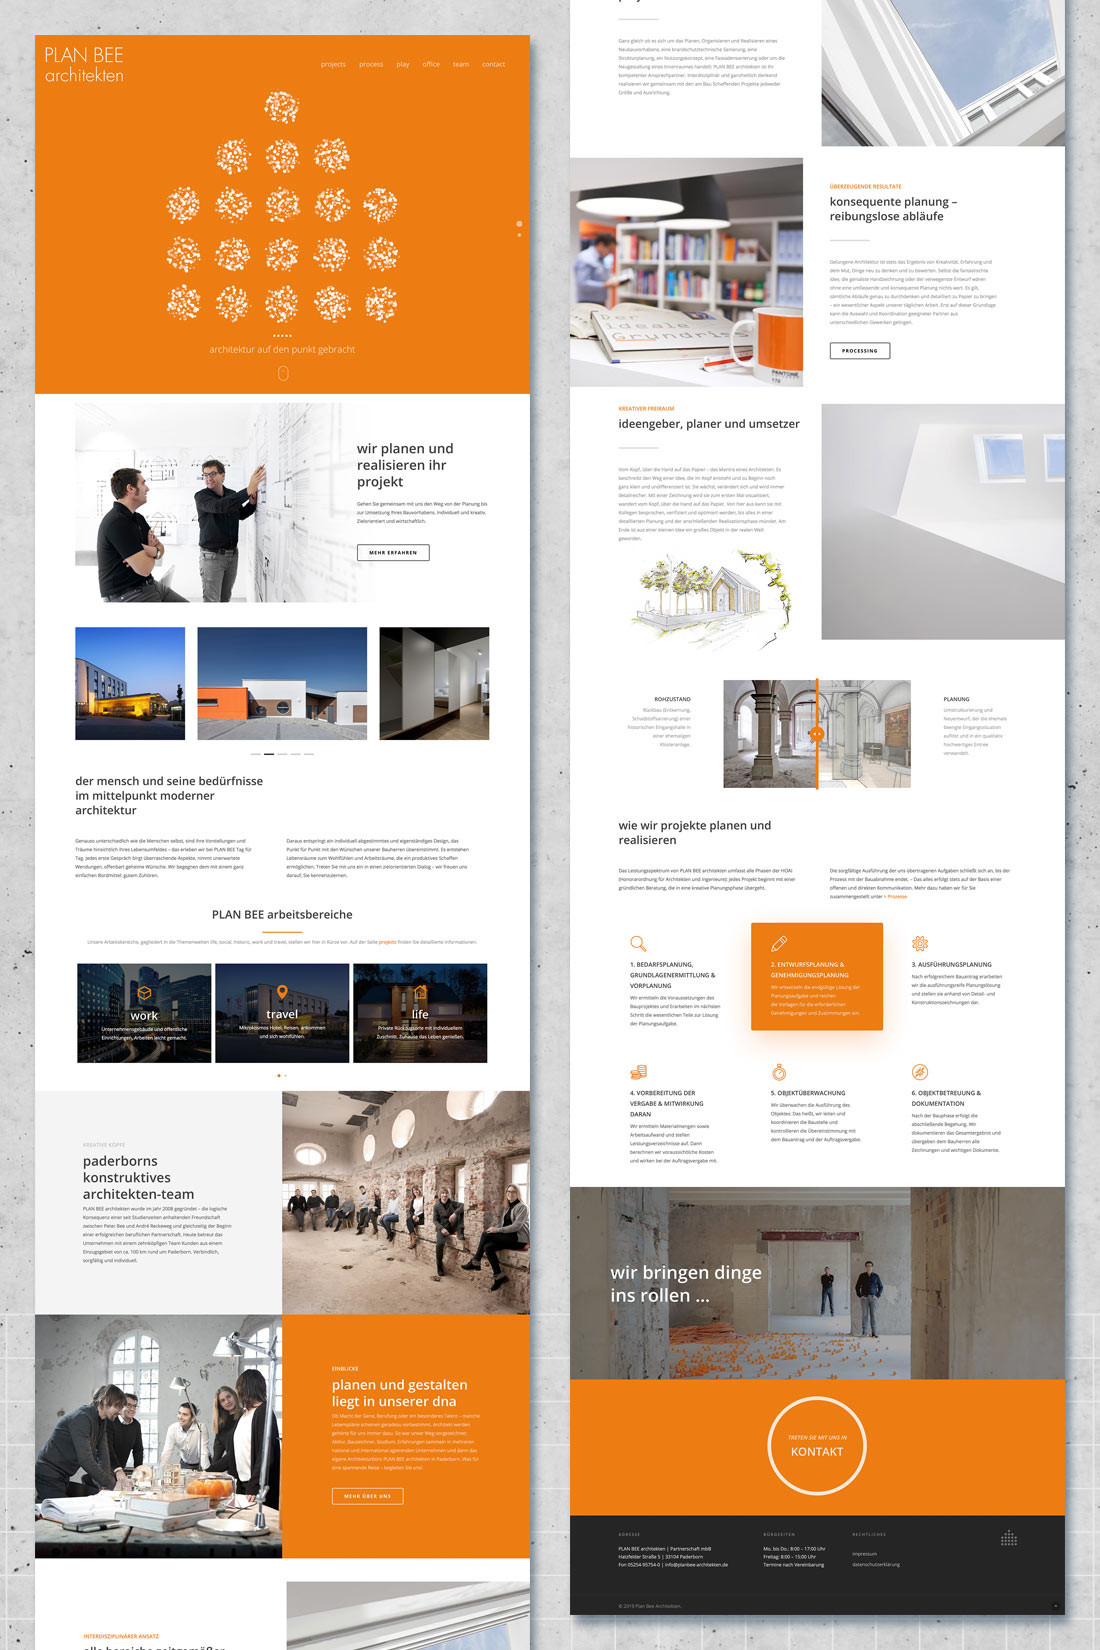 Webdesign aus Paderborn